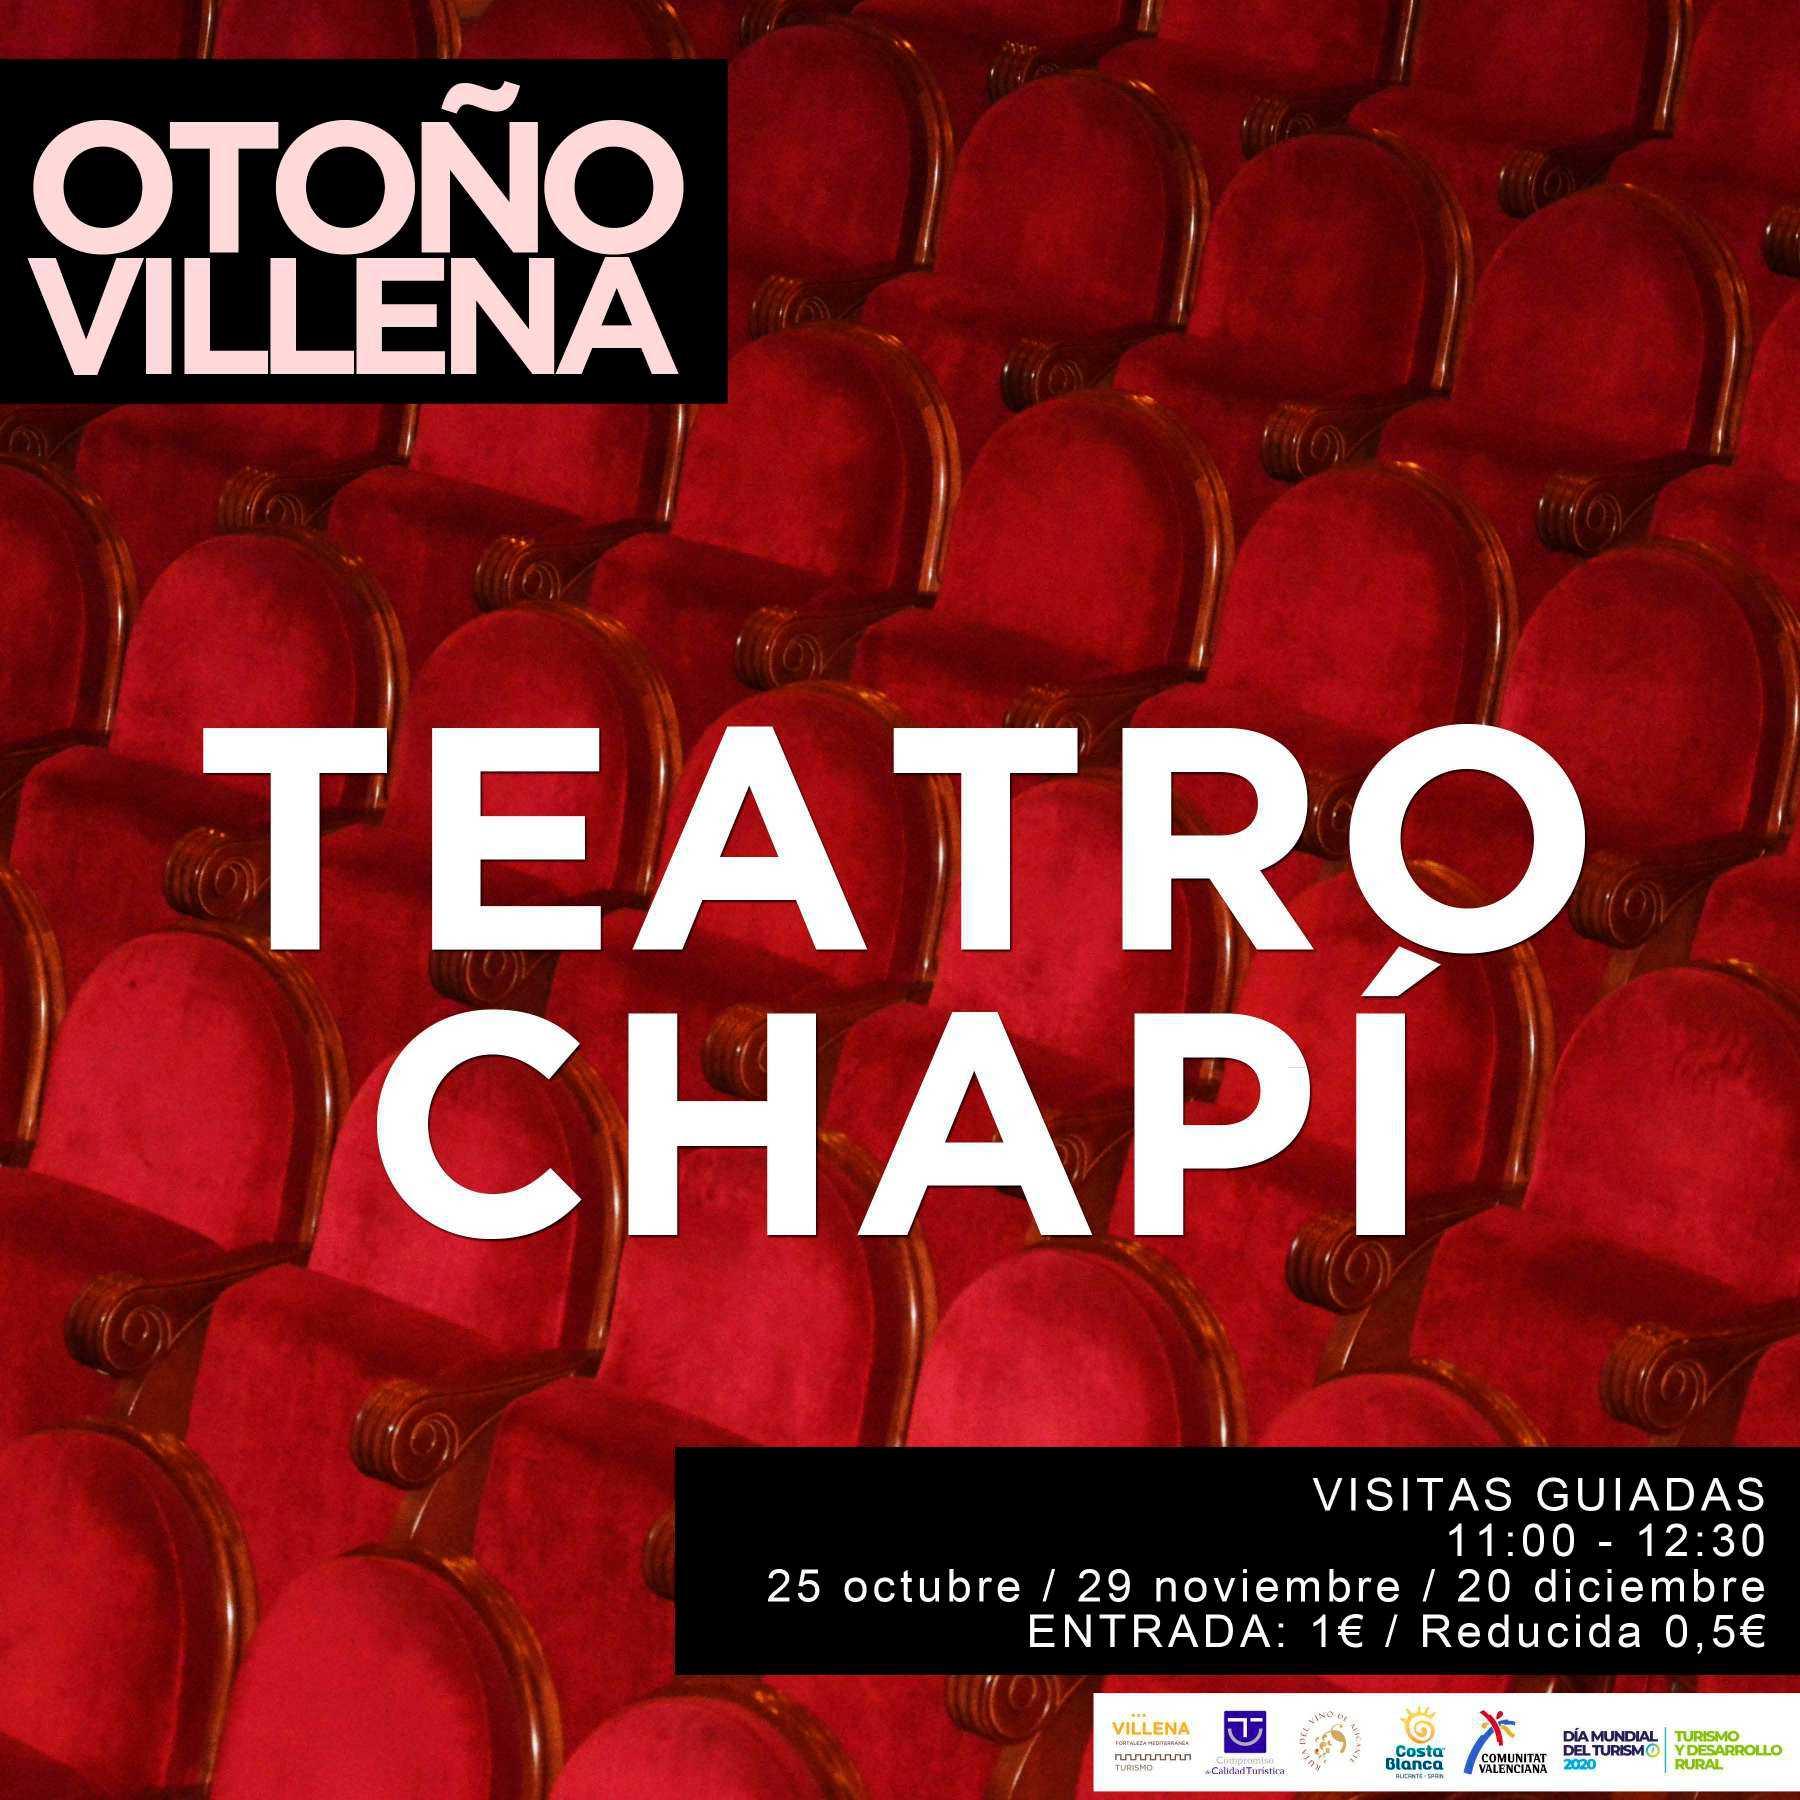 Visita guiada al Teatro Chapí